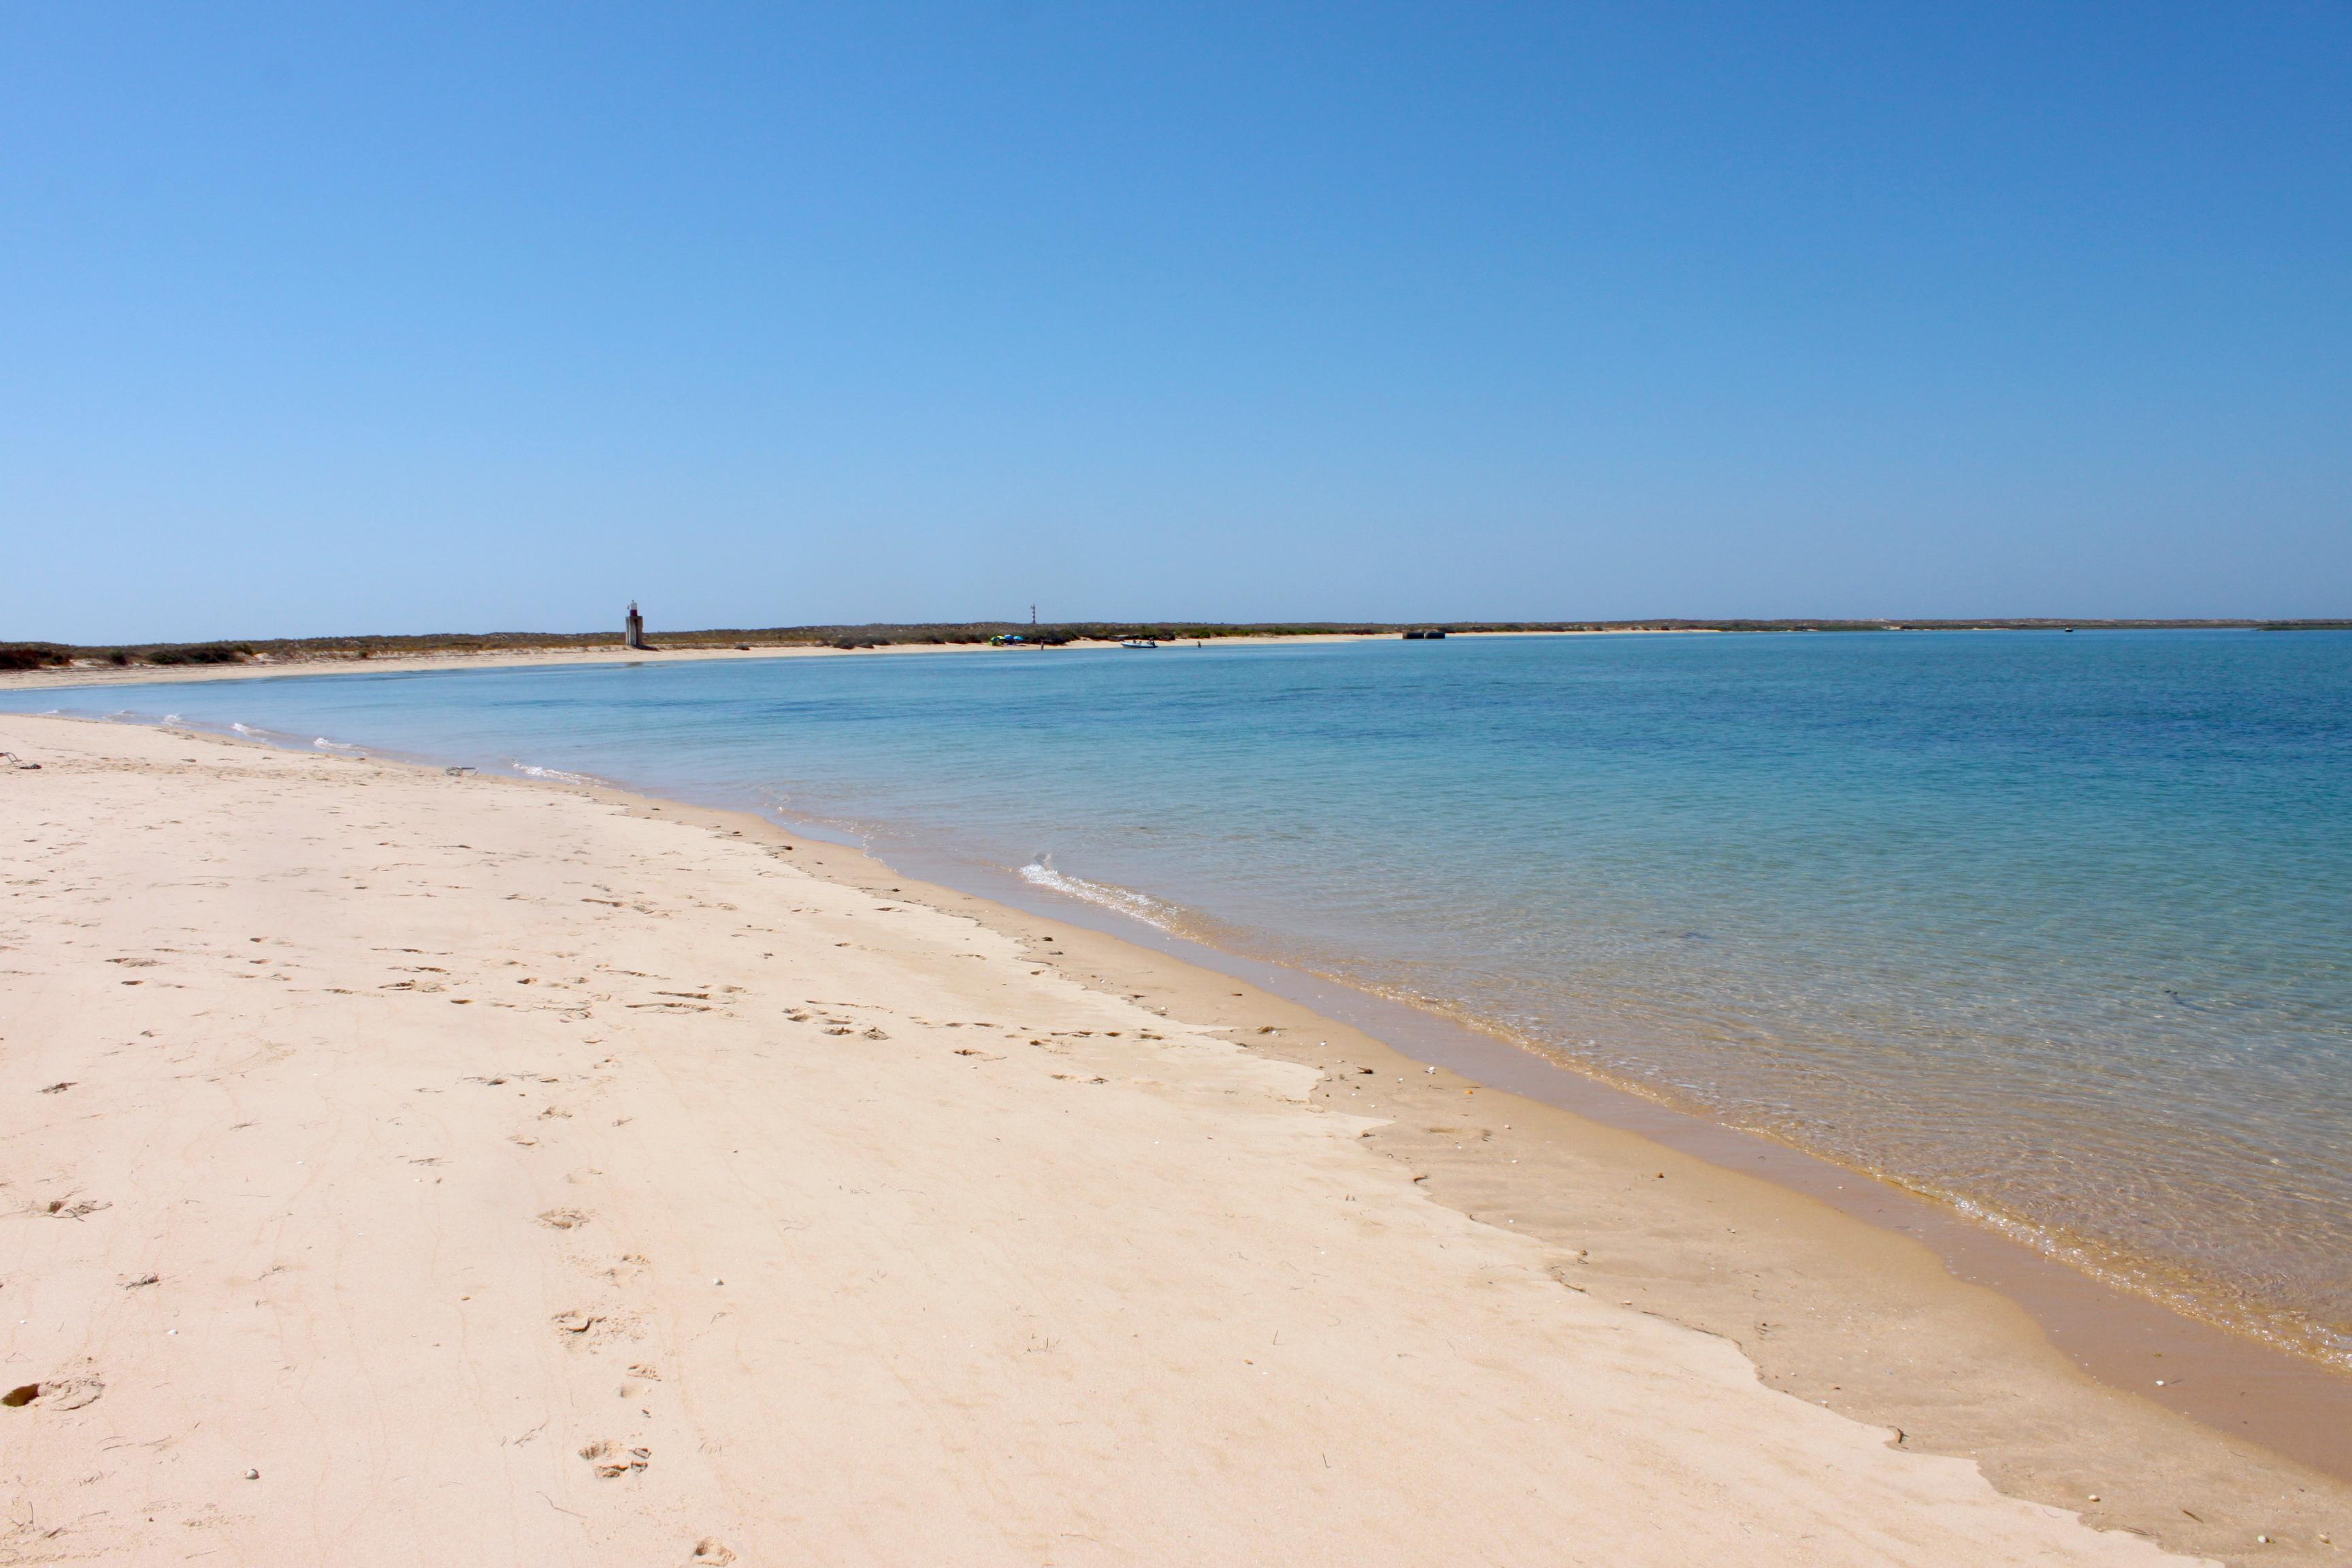 Ilha deserta, senza filtri, senza postproduzione, senza turisti